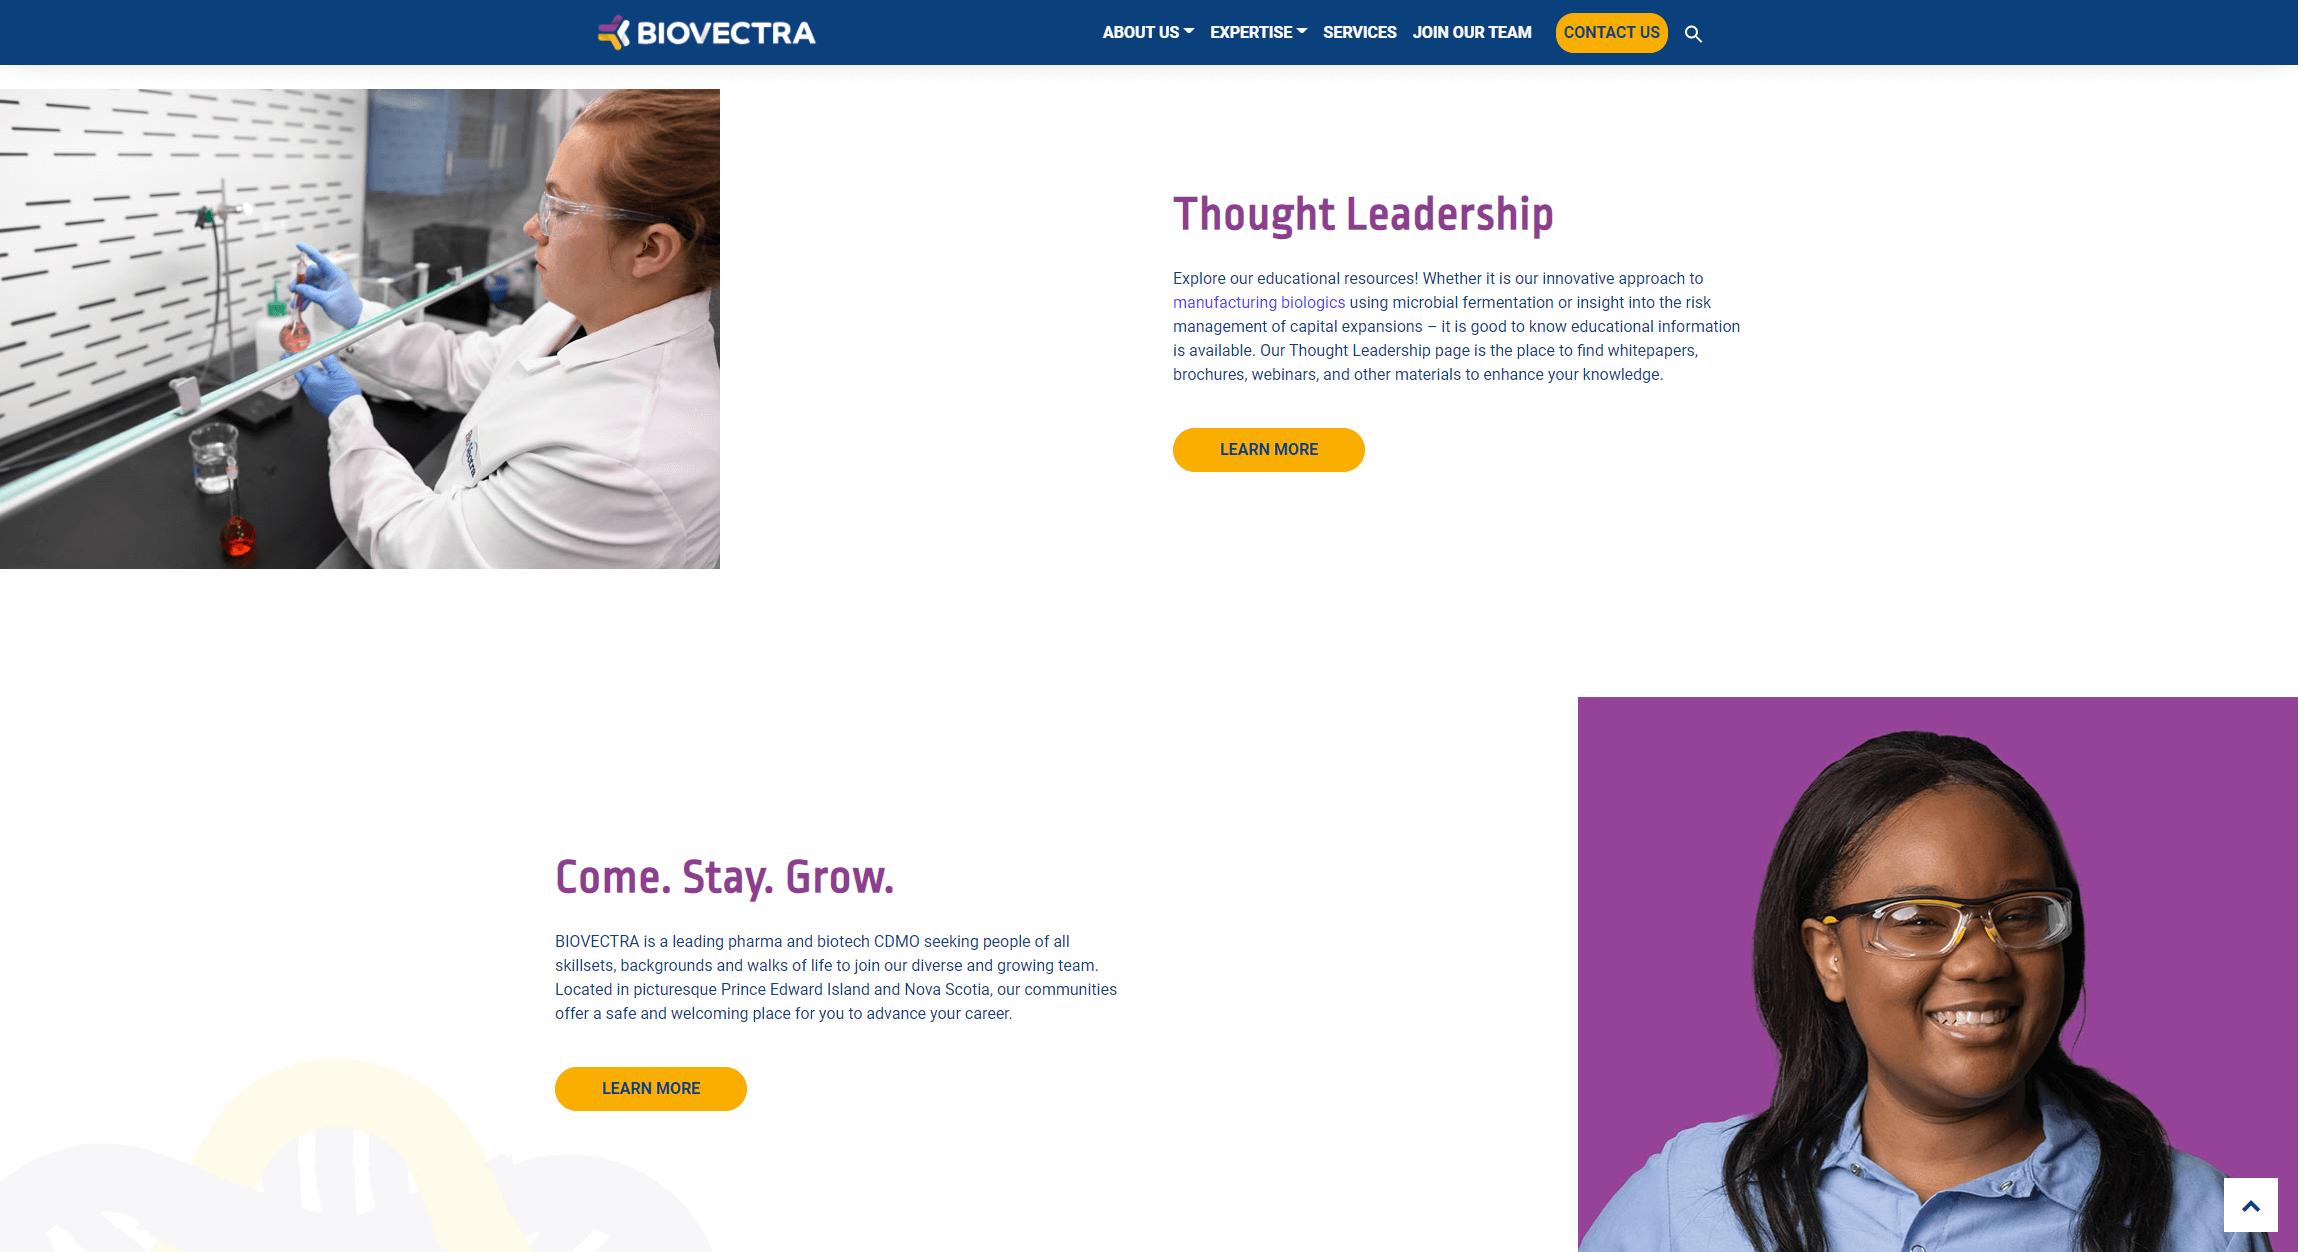 www.biovectra.com-3